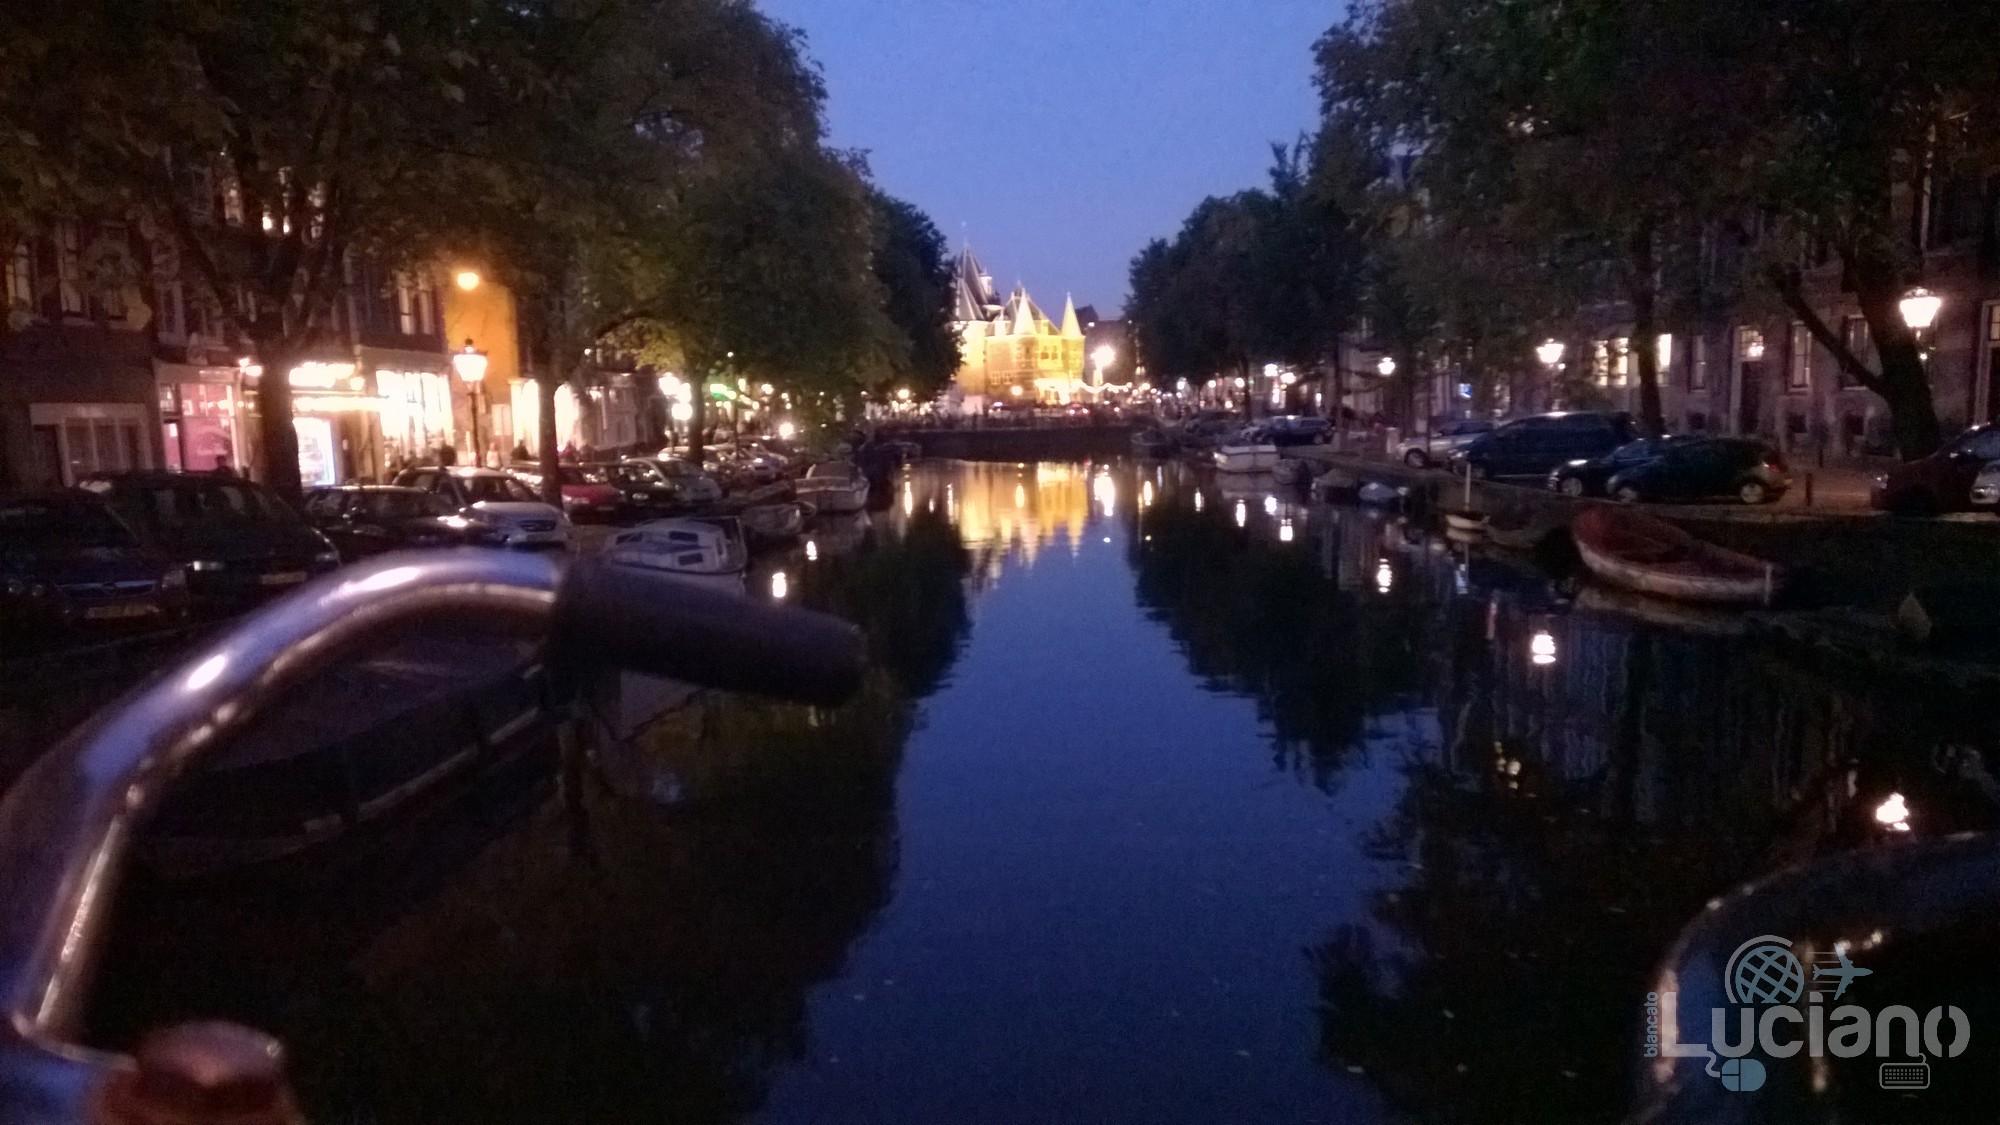 amsterdam-2014-vueling-lucianoblancatoit (50)